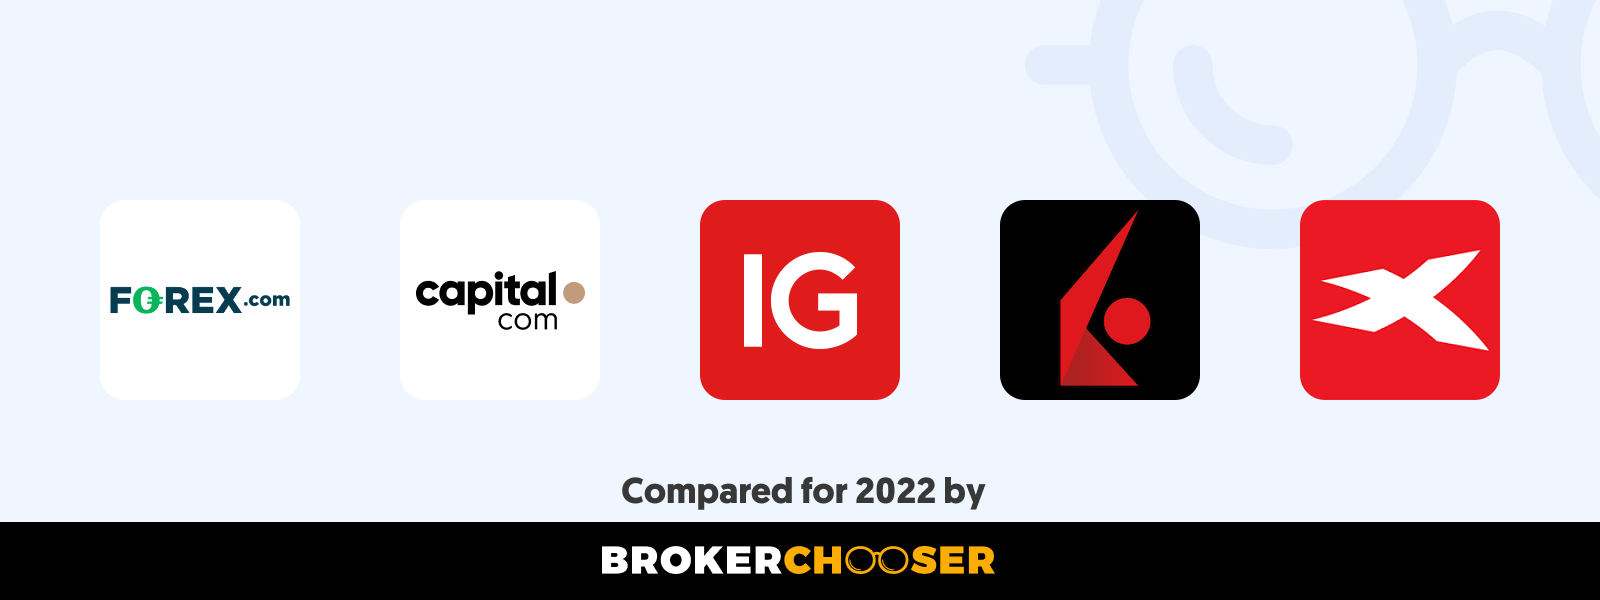 Best forex brokers for beginners in Lesotho in 2021